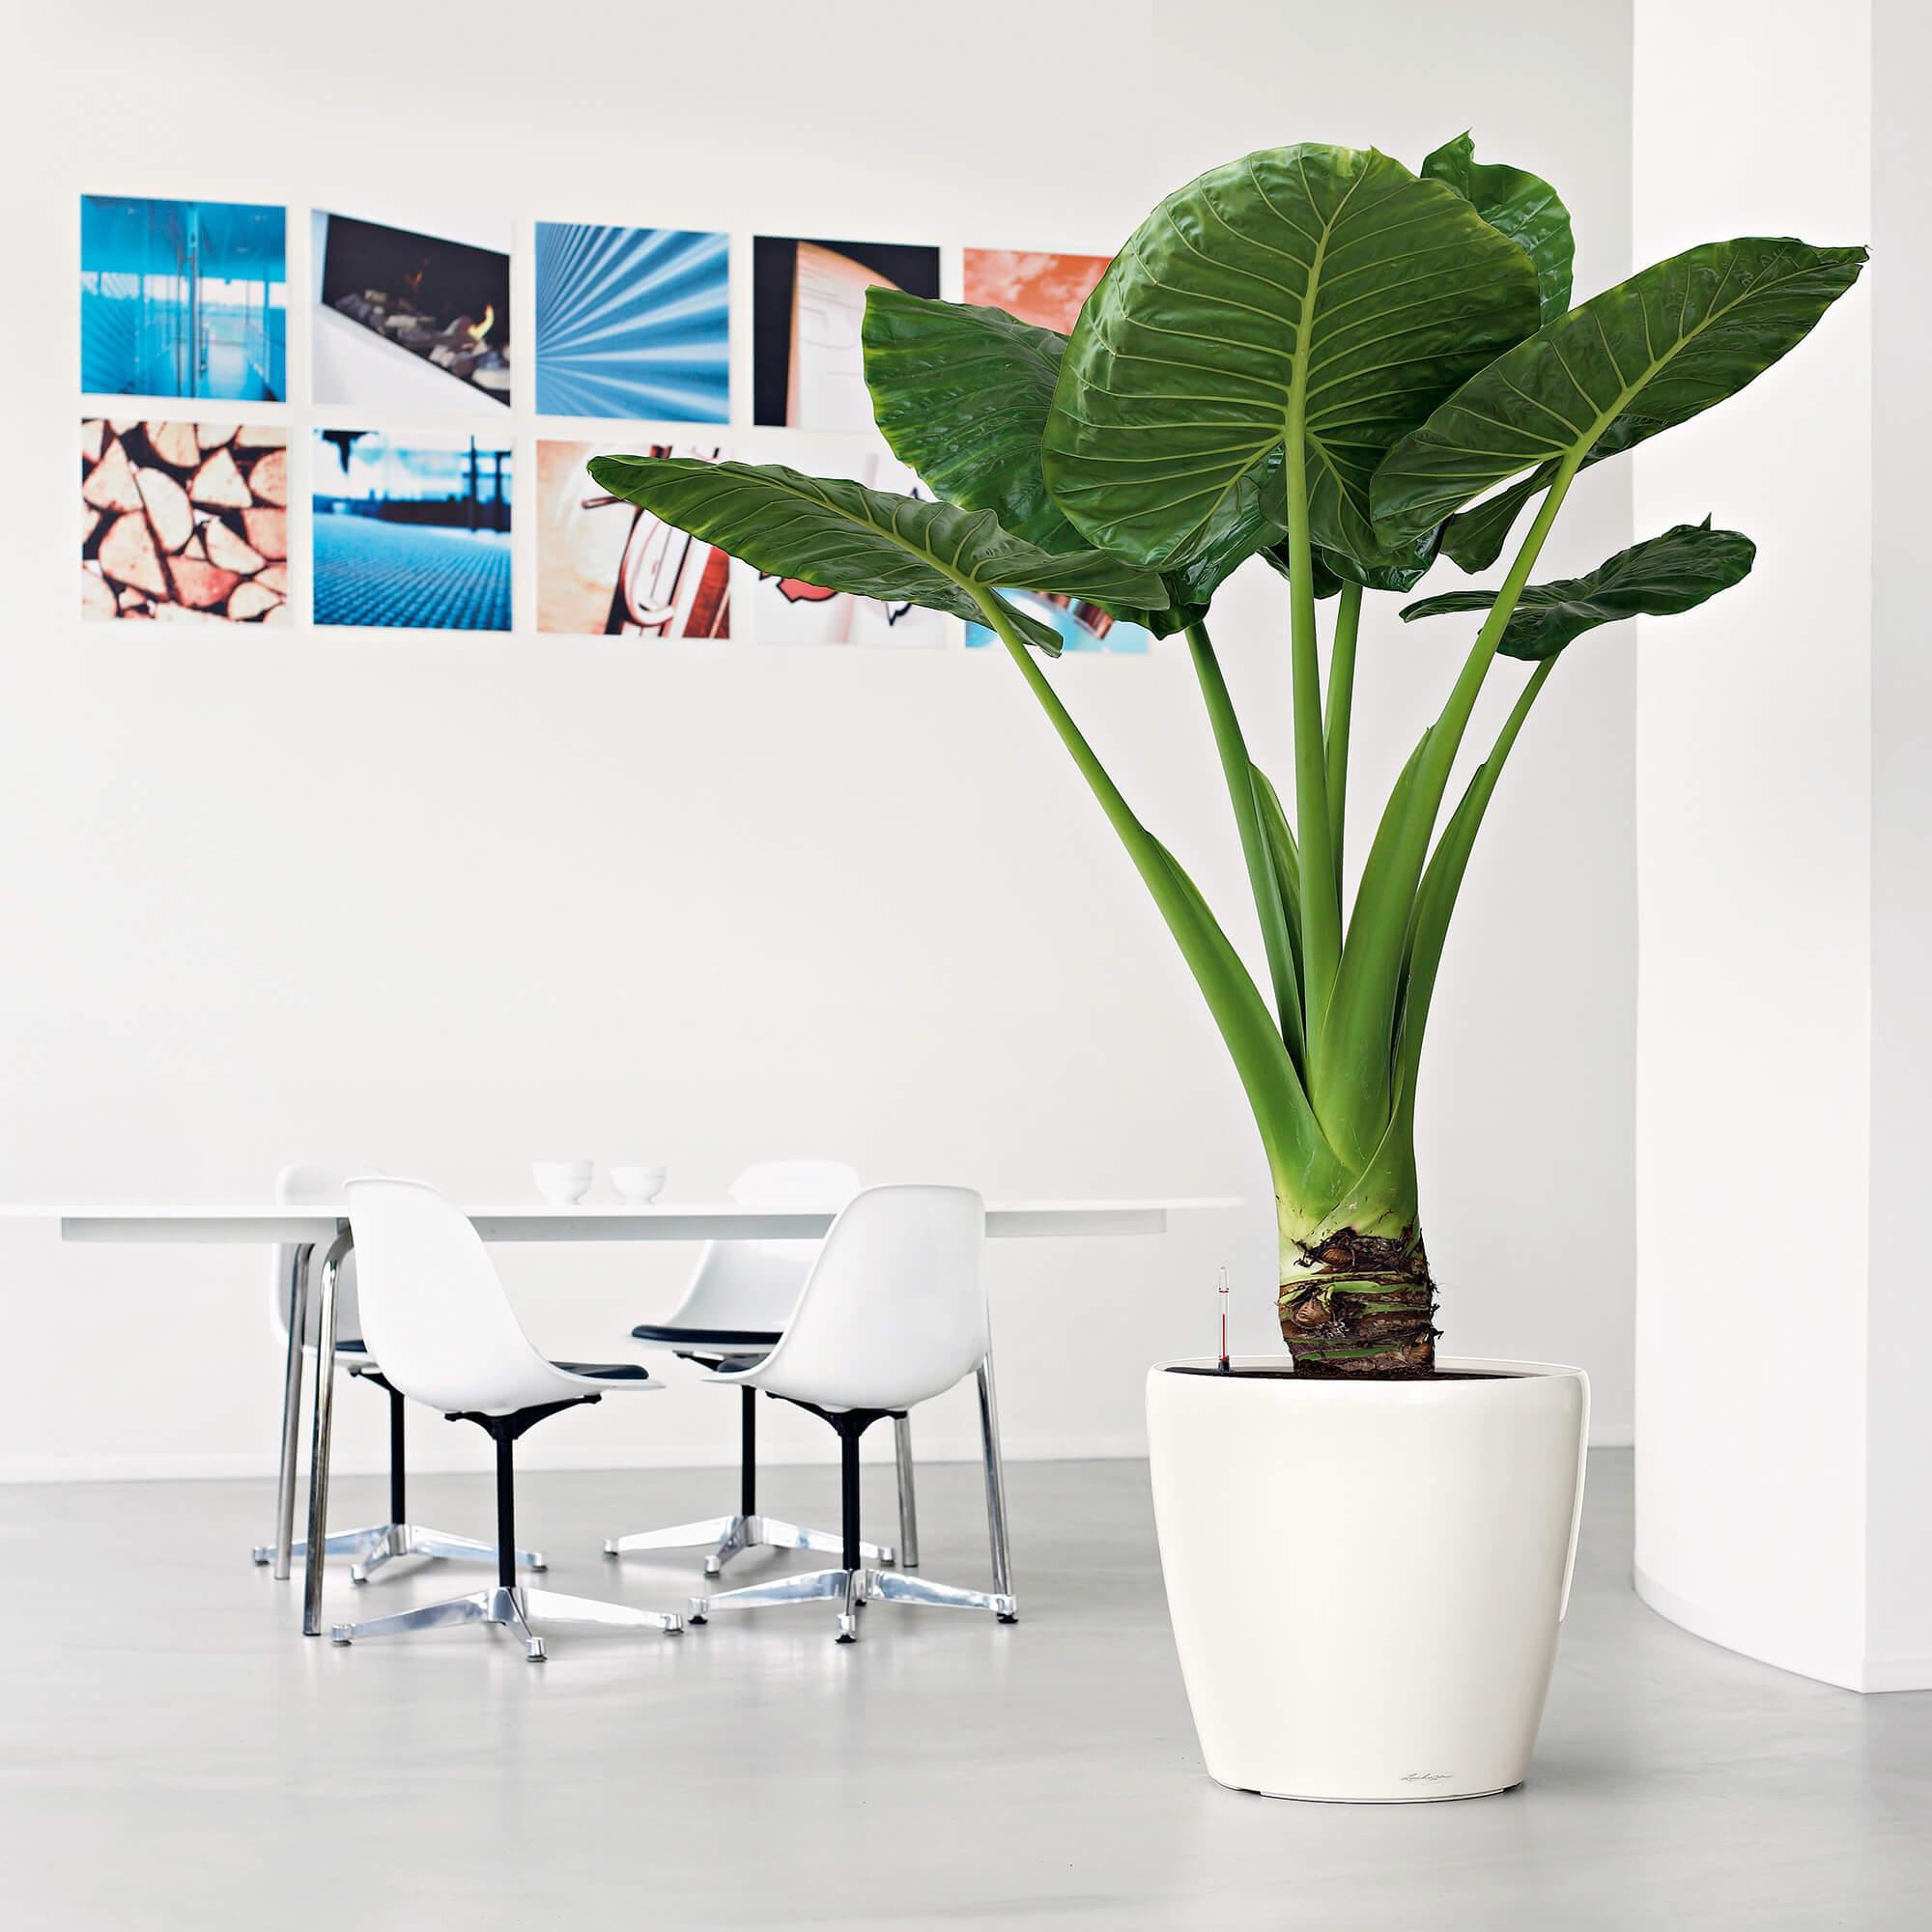 CLASSICO LS 50 white high-gloss - Image 5